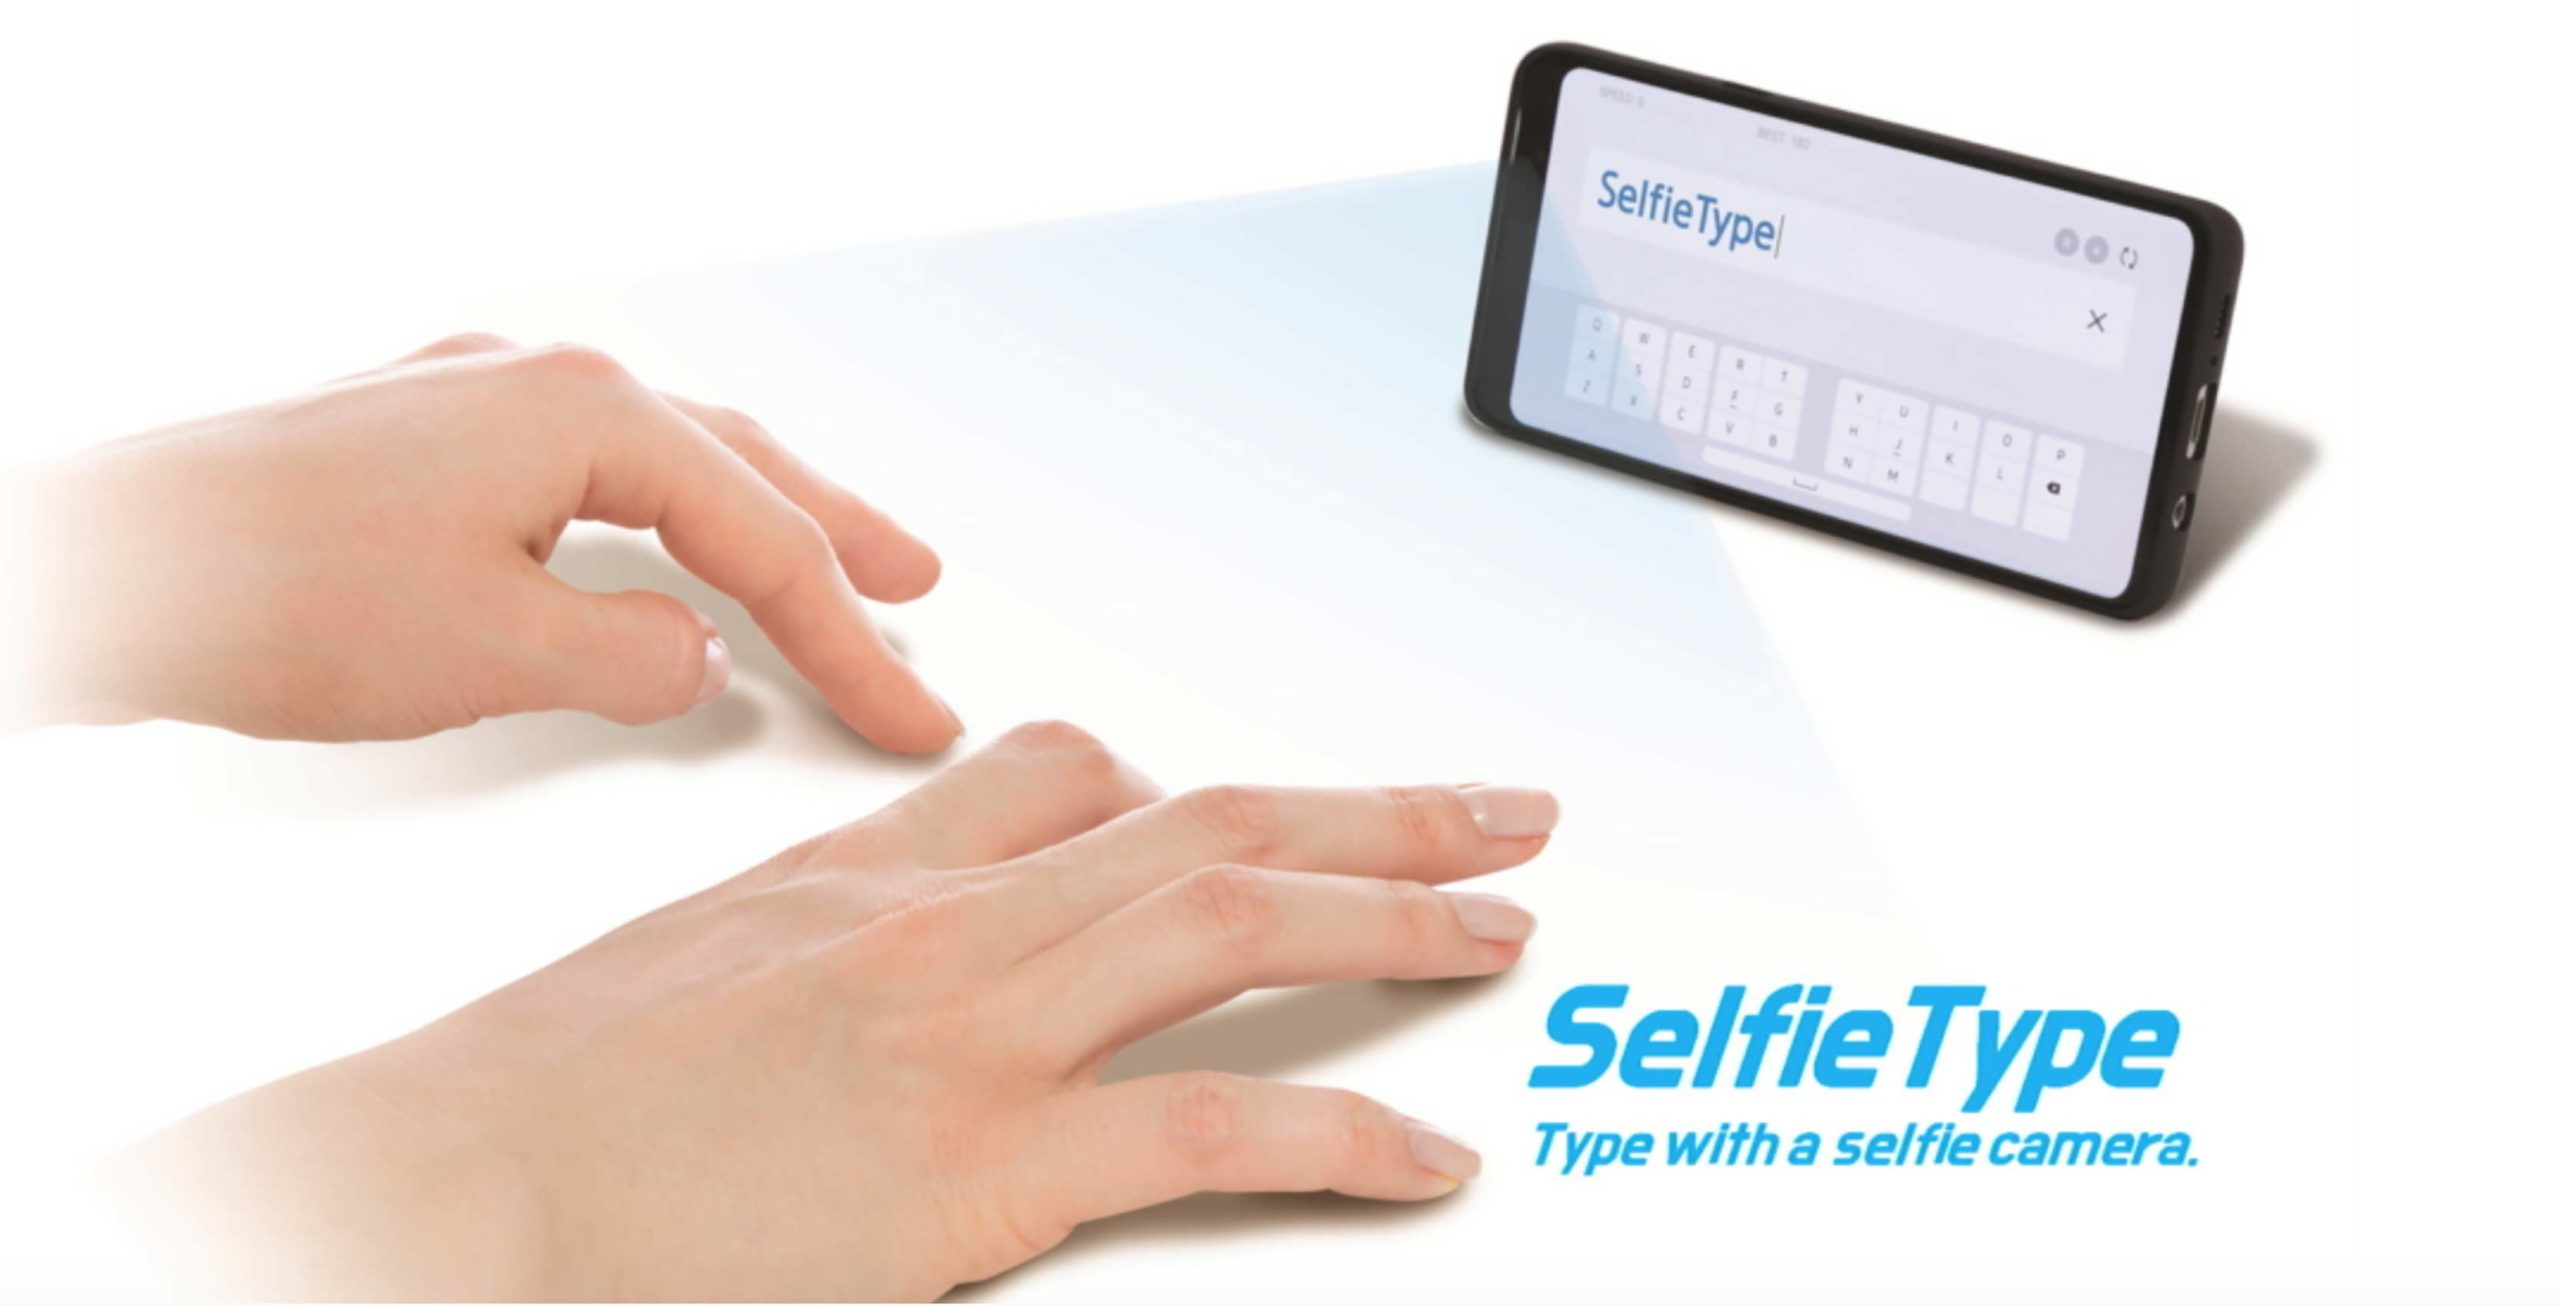 Samsung SelfieType